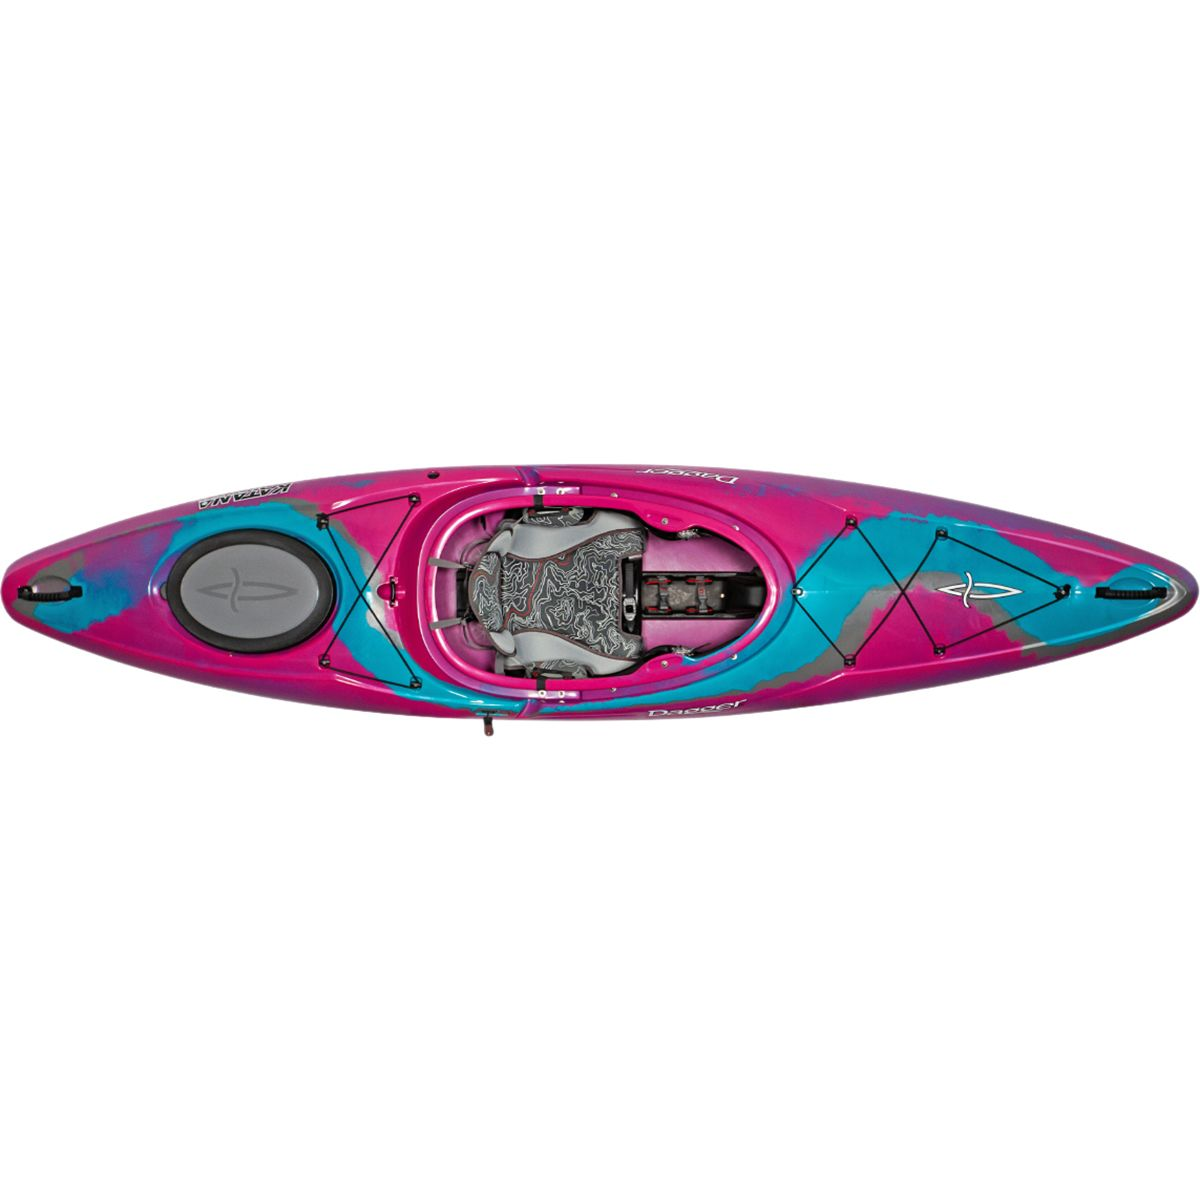 photo: Dagger Katana 10.4 whitewater kayak